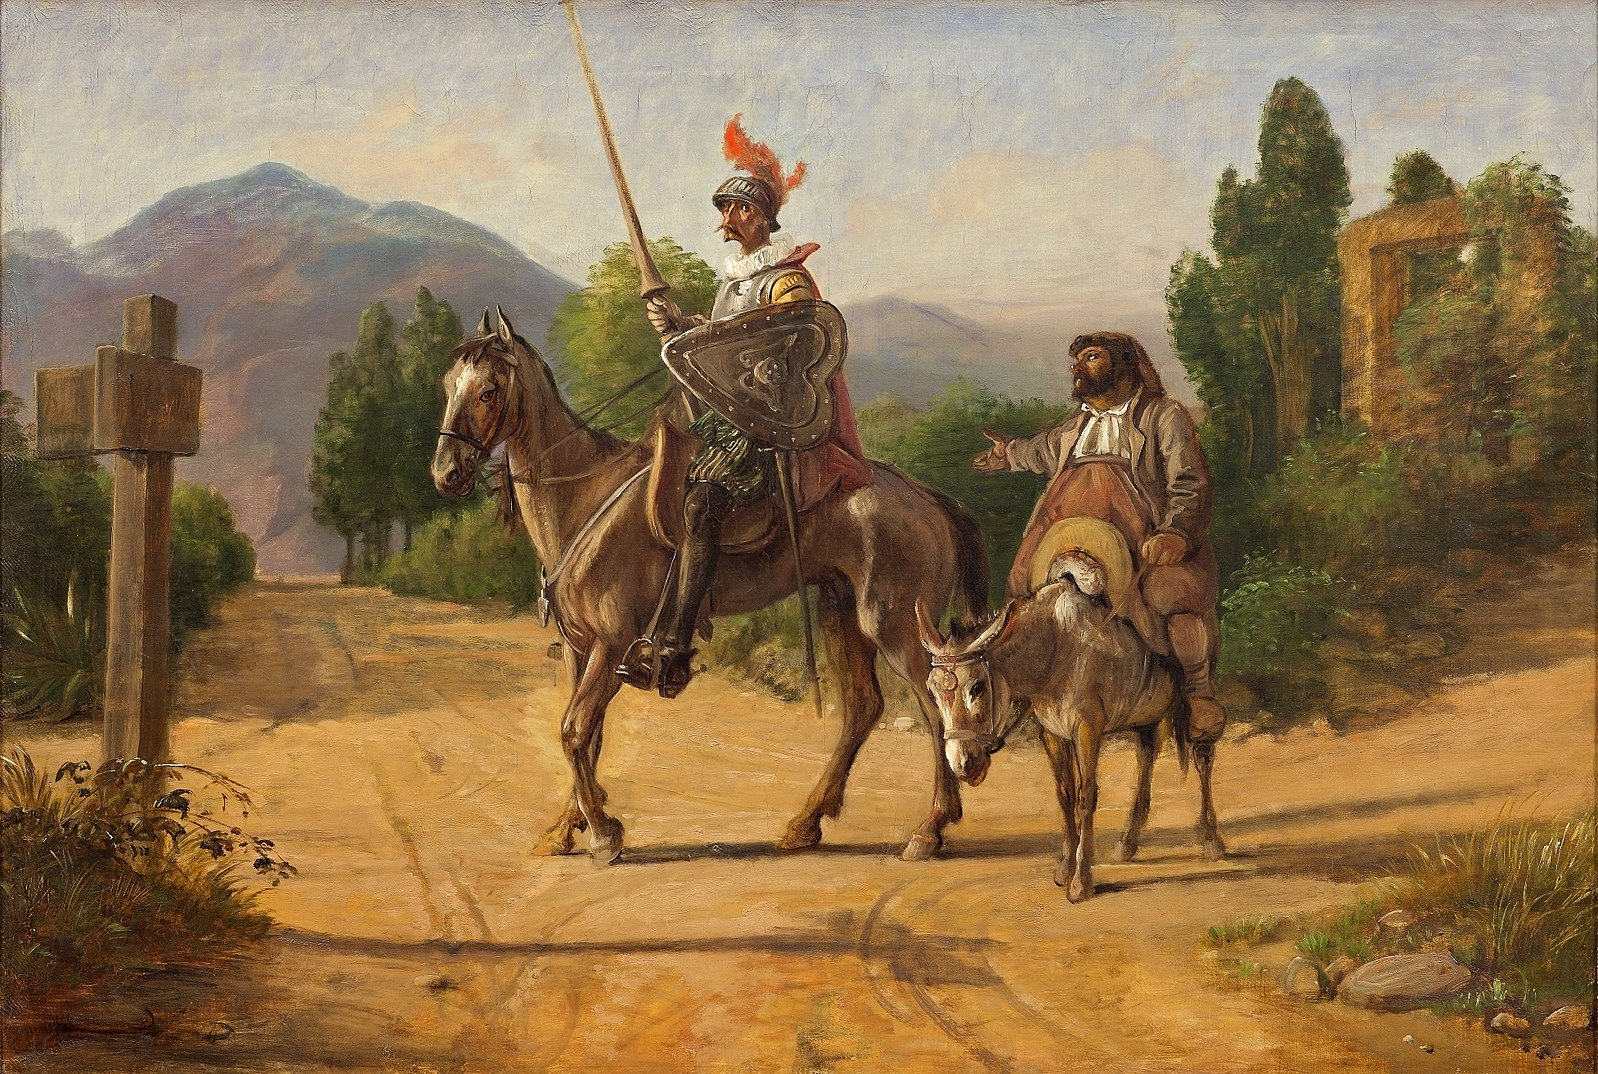 Wilhelm Marstrand, Don Quixote og Sancho Panza, 1847, Wikimedia Commons